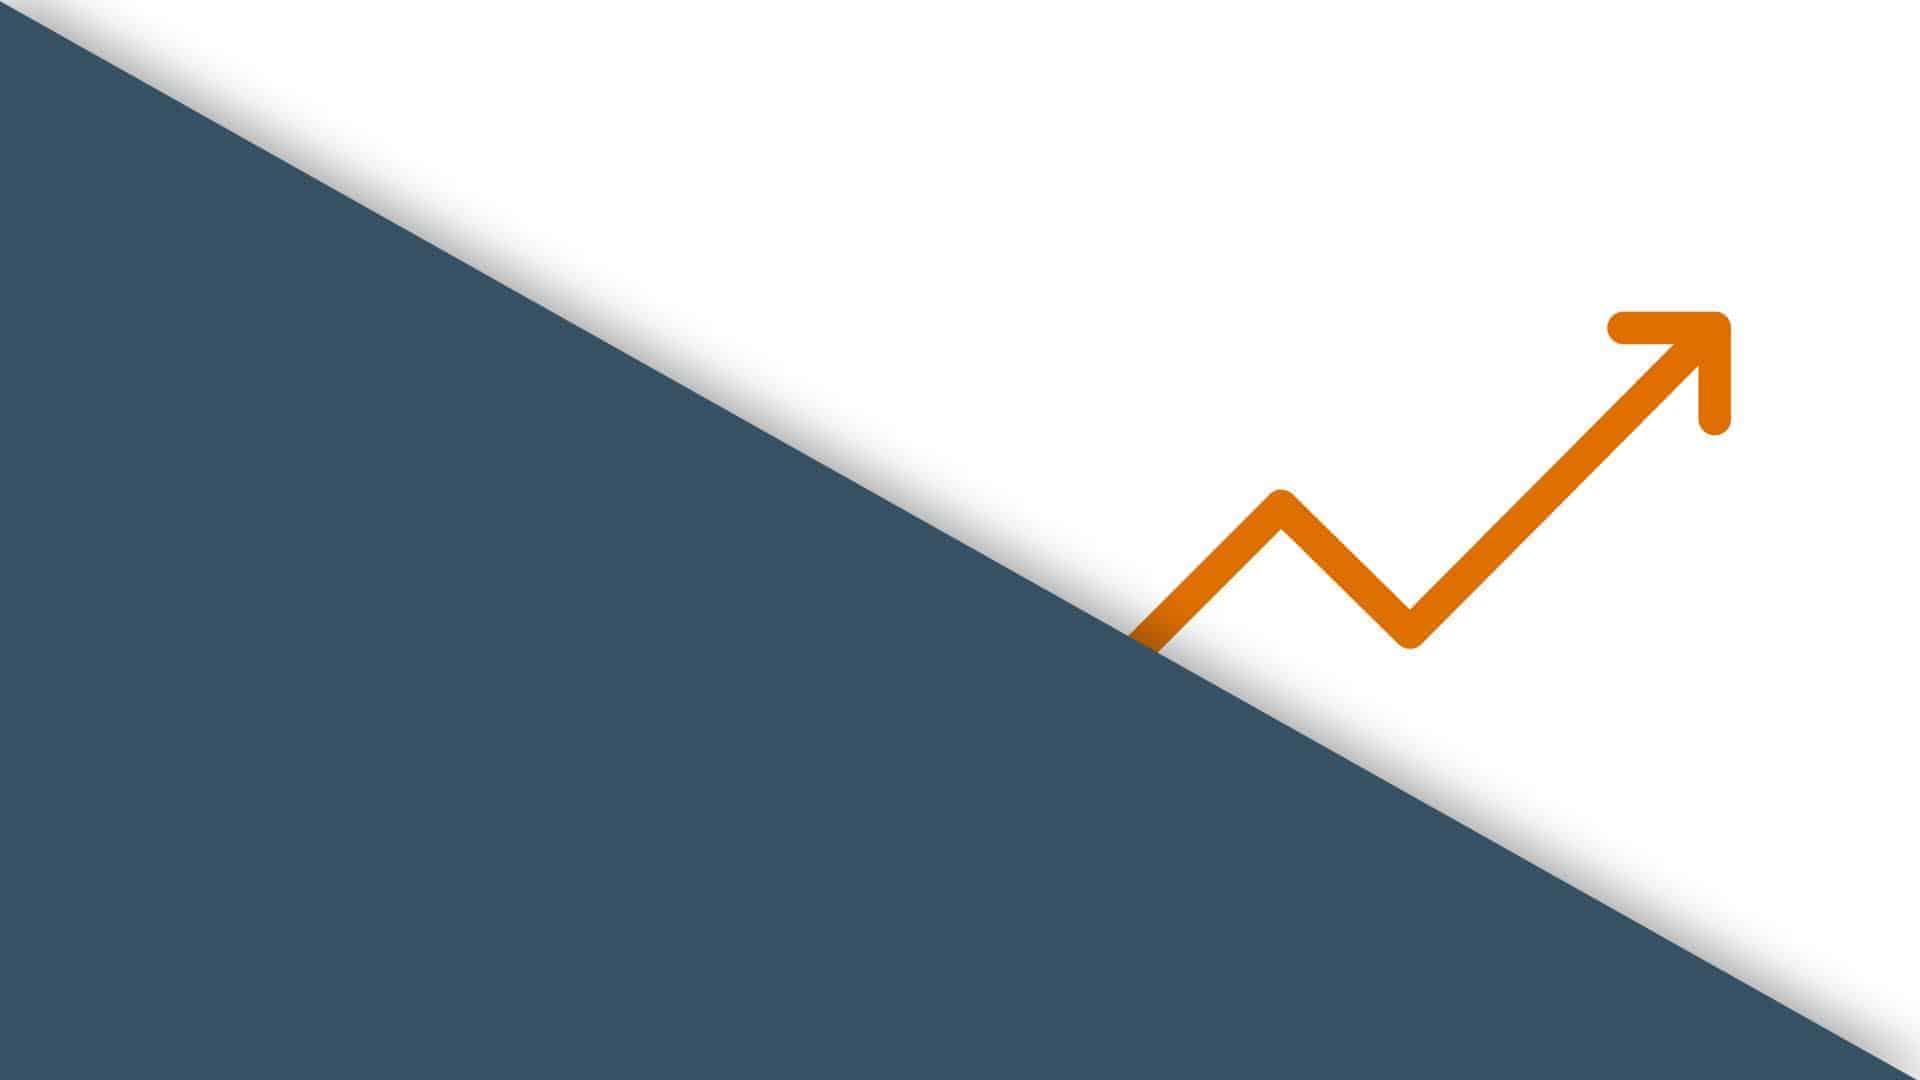 <mark>¿Cómo conectar WordPress con Google Analytics?</mark> 10